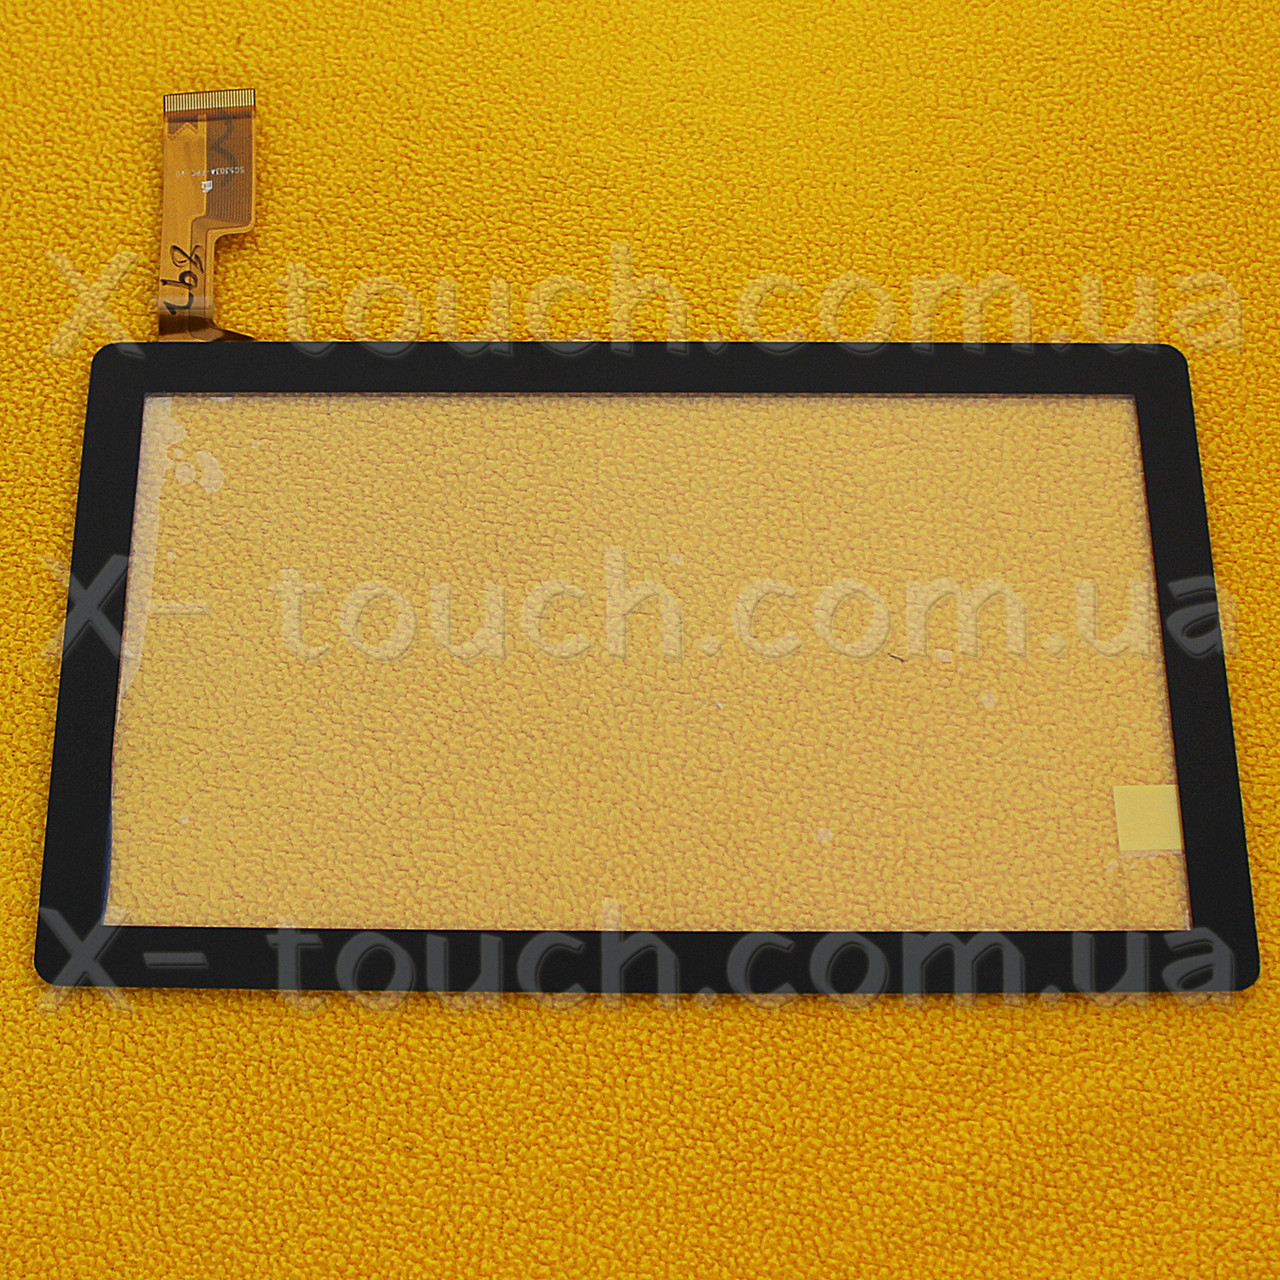 Тачскрин, сенсор  MGLCTP-202  для планшета